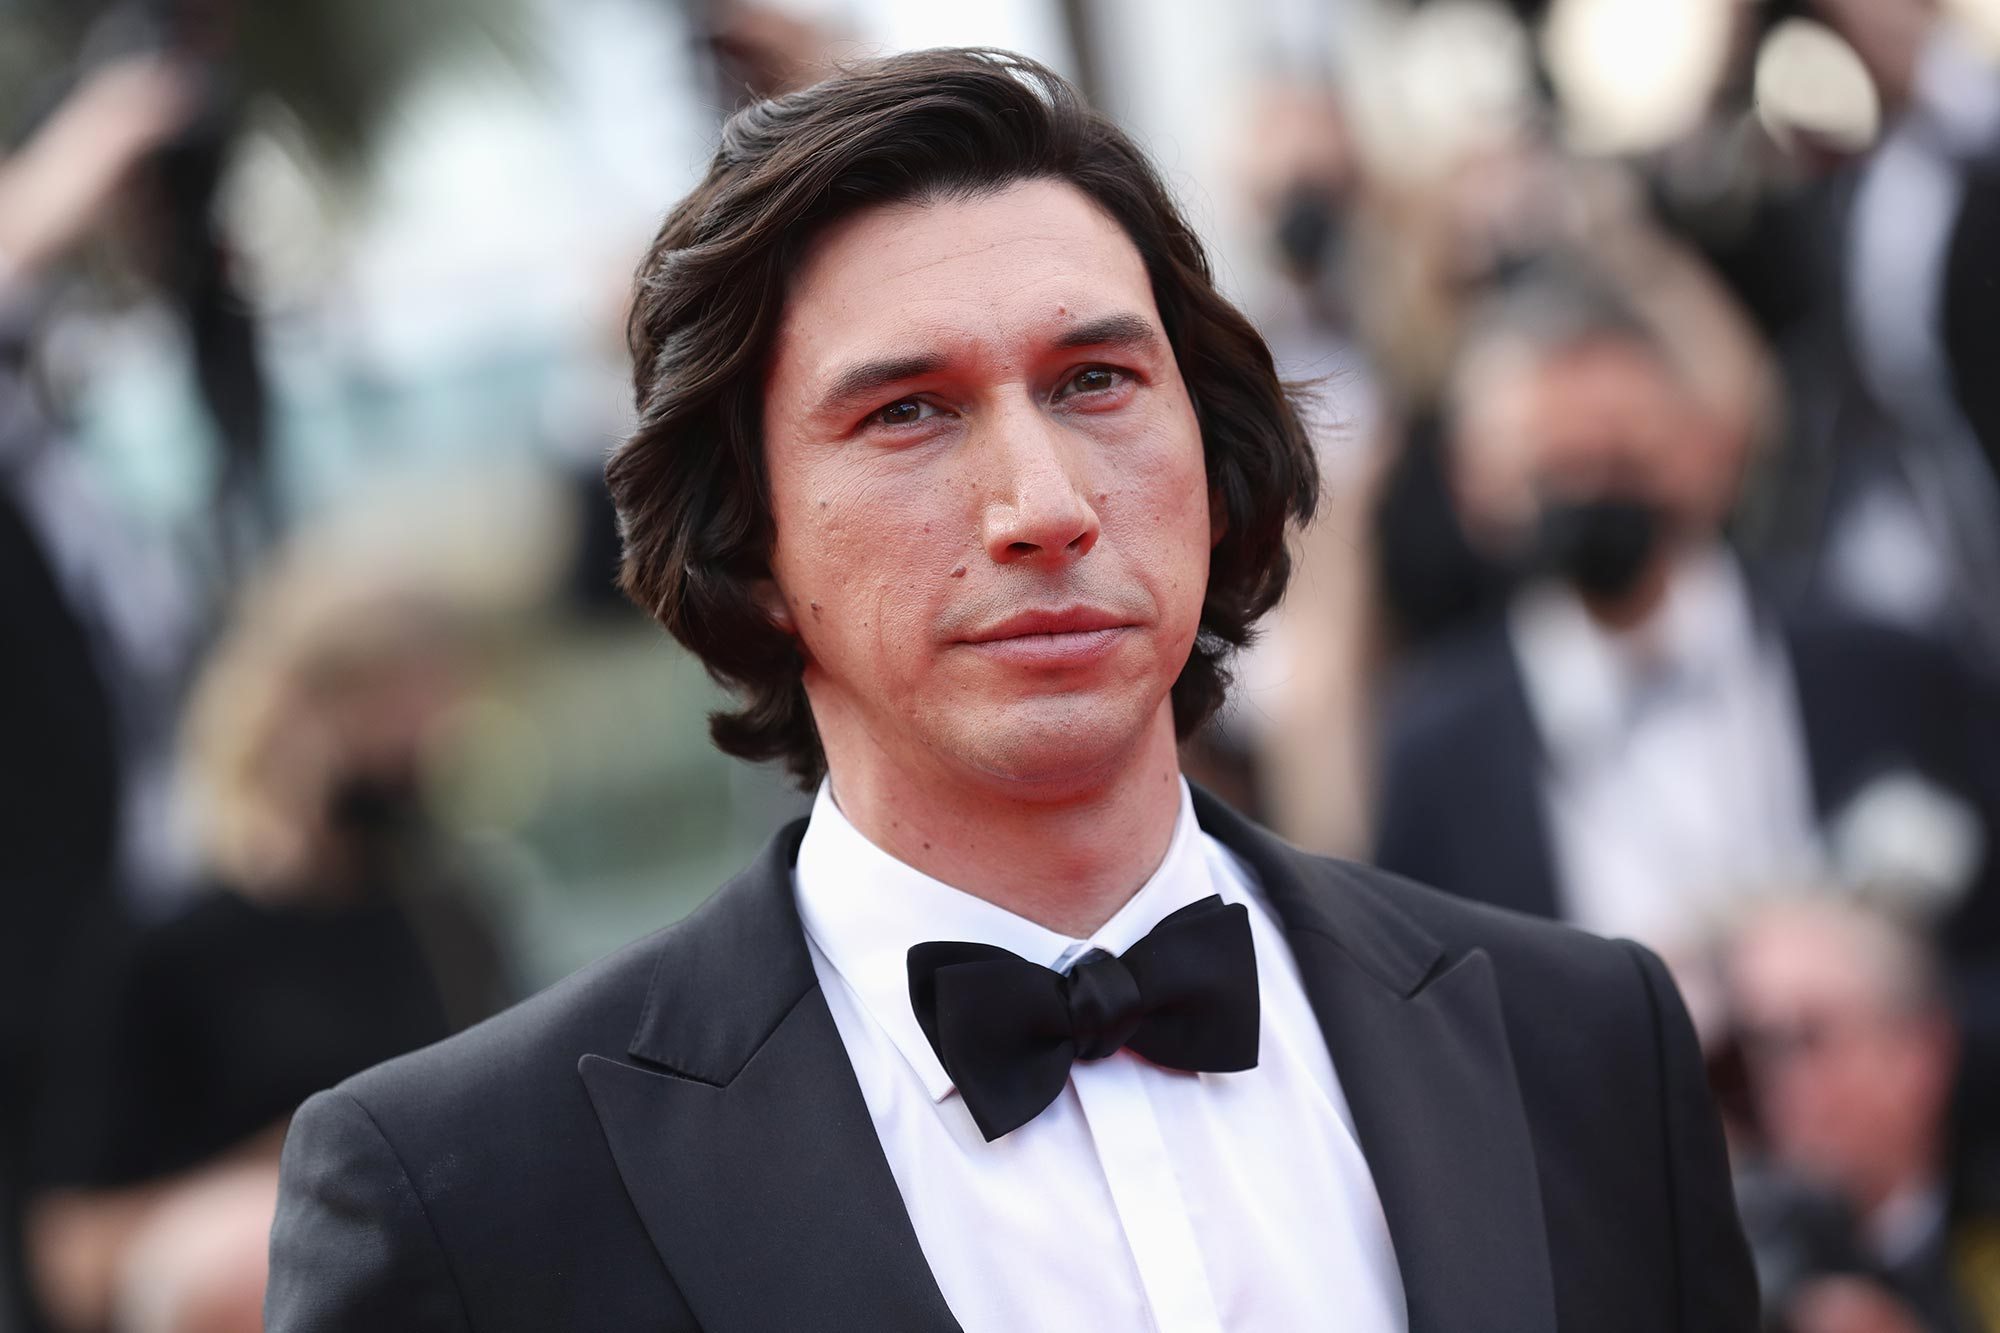 Cannes 2021 Red Carpet- Adam Driver